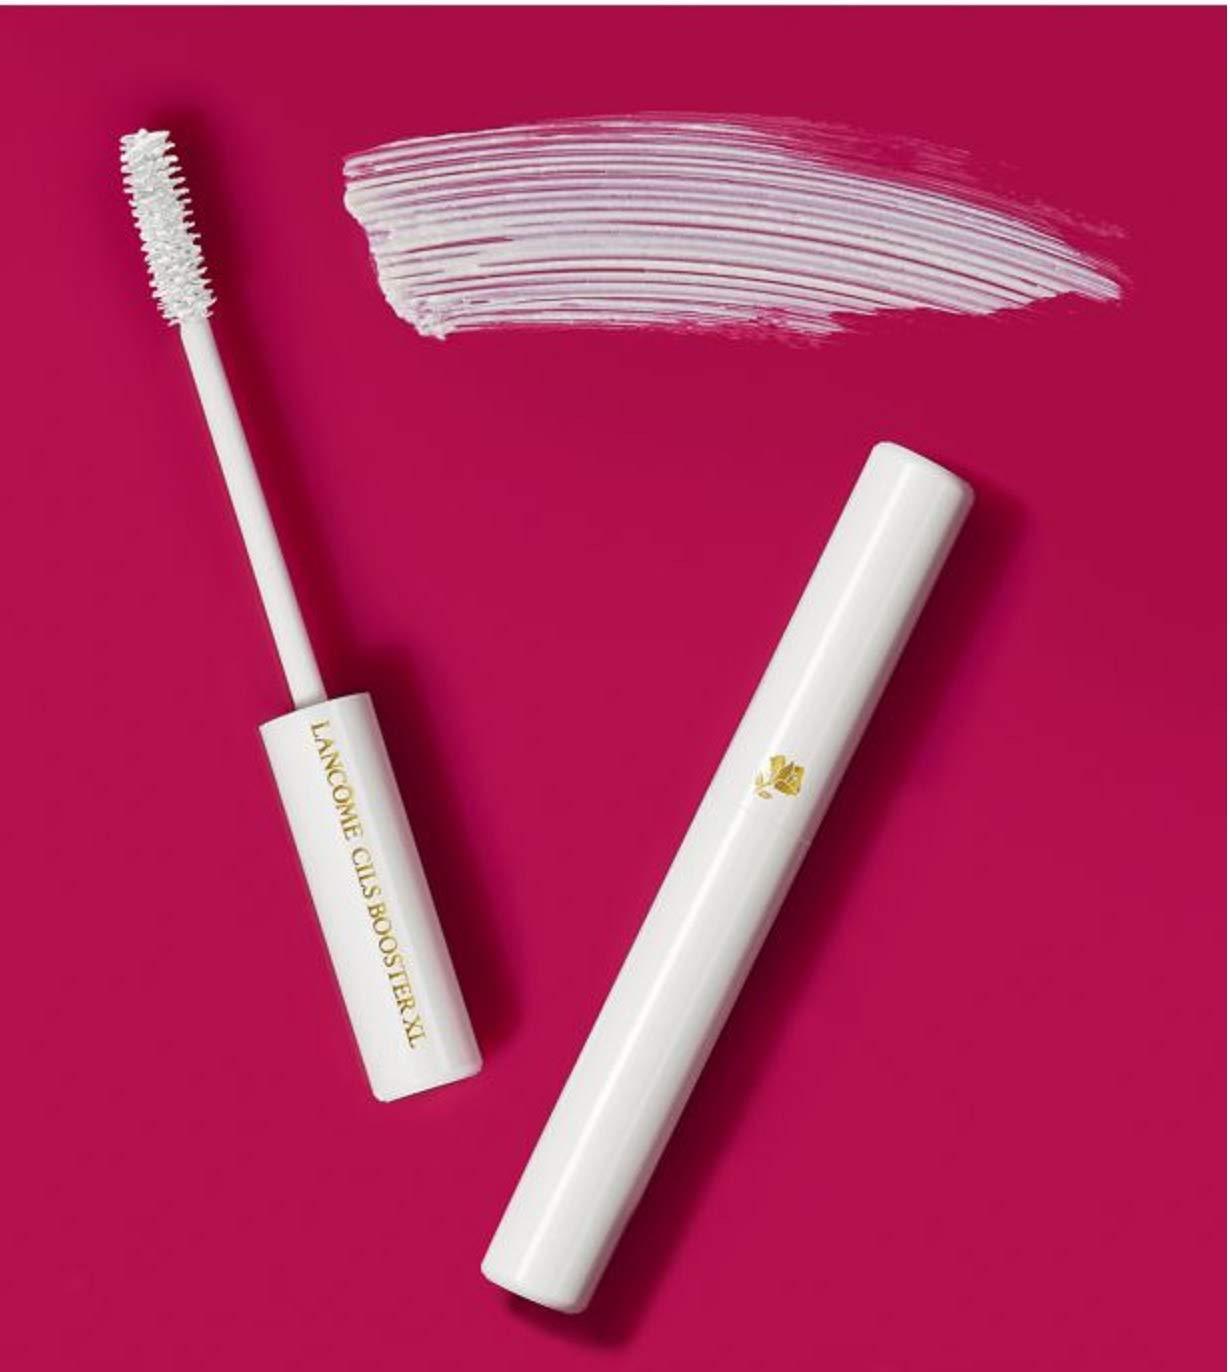 Cils Booster XL Vitamin-Infused Mascara Primer LAN CÔME